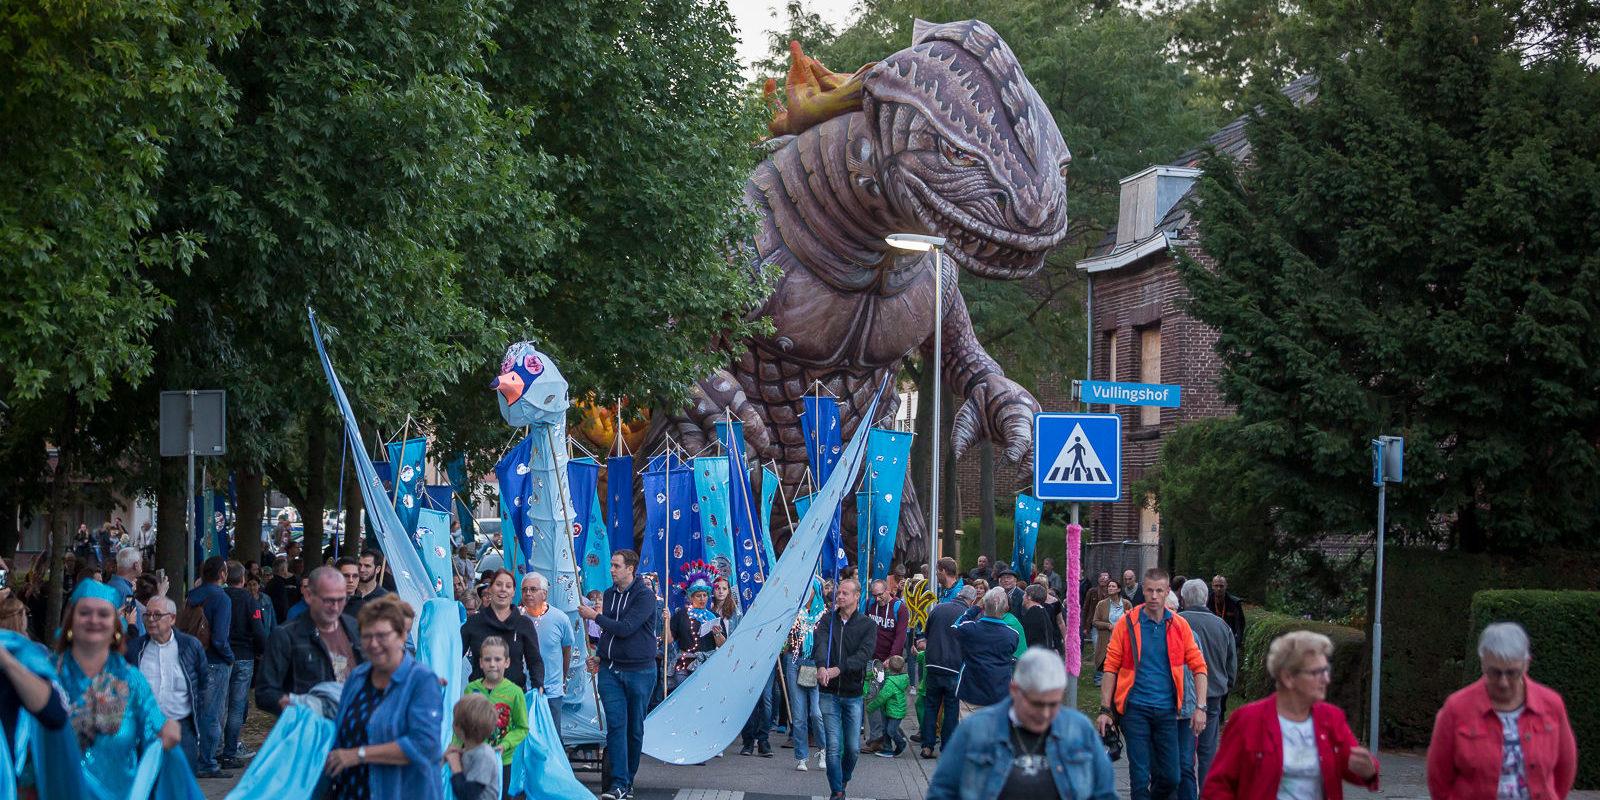 Heerlerbaan Op 100ste Verjaardag Oog In Oog Met Godzilla Cultura Nova